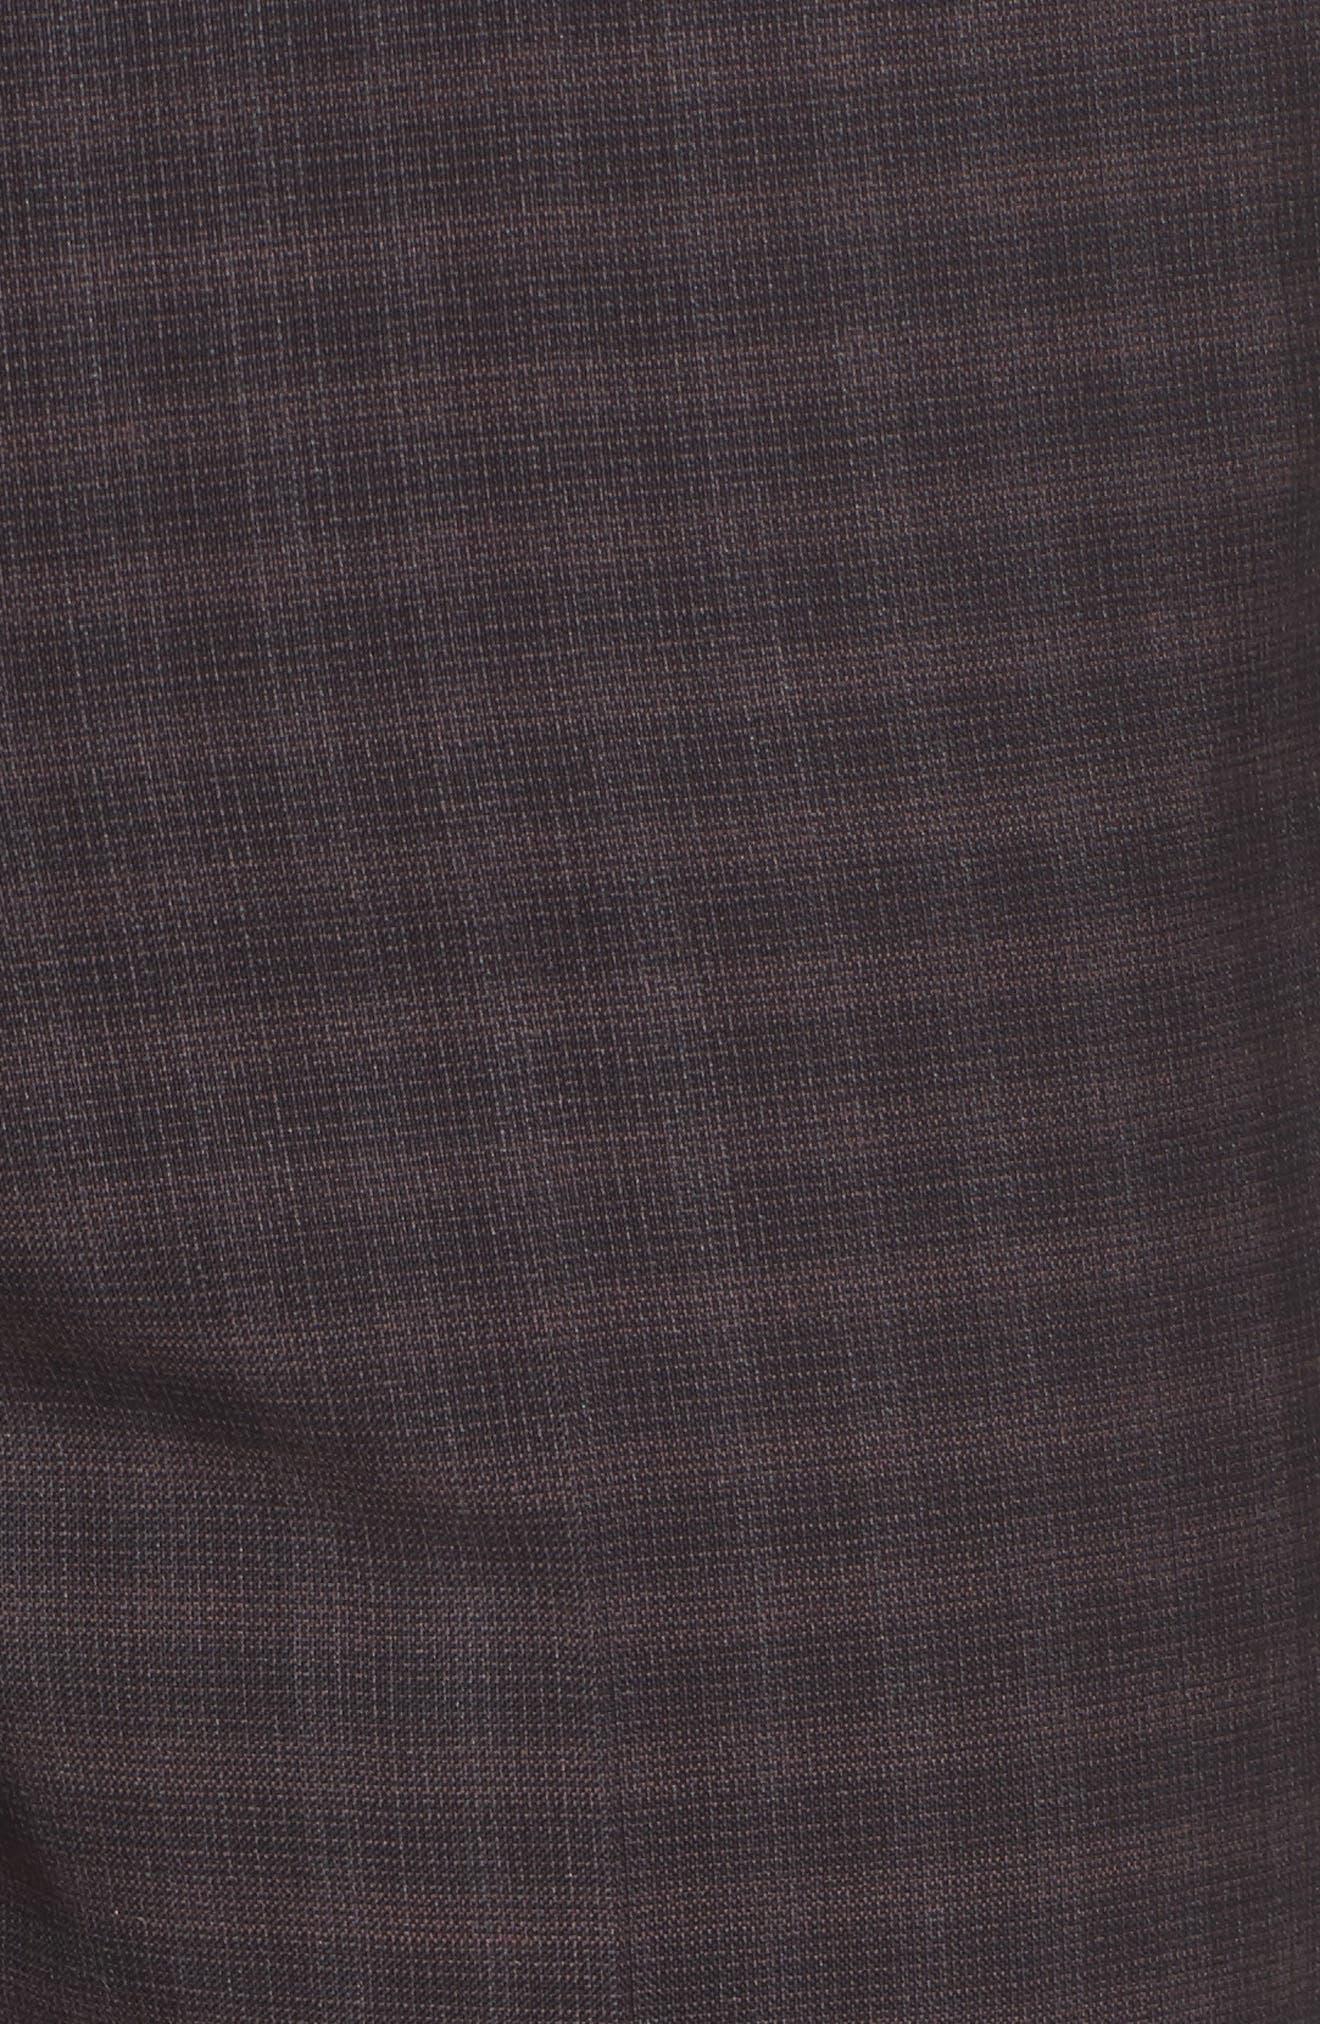 Benso Regular Fit Wool Trousers,                             Alternate thumbnail 5, color,                             Dark Red